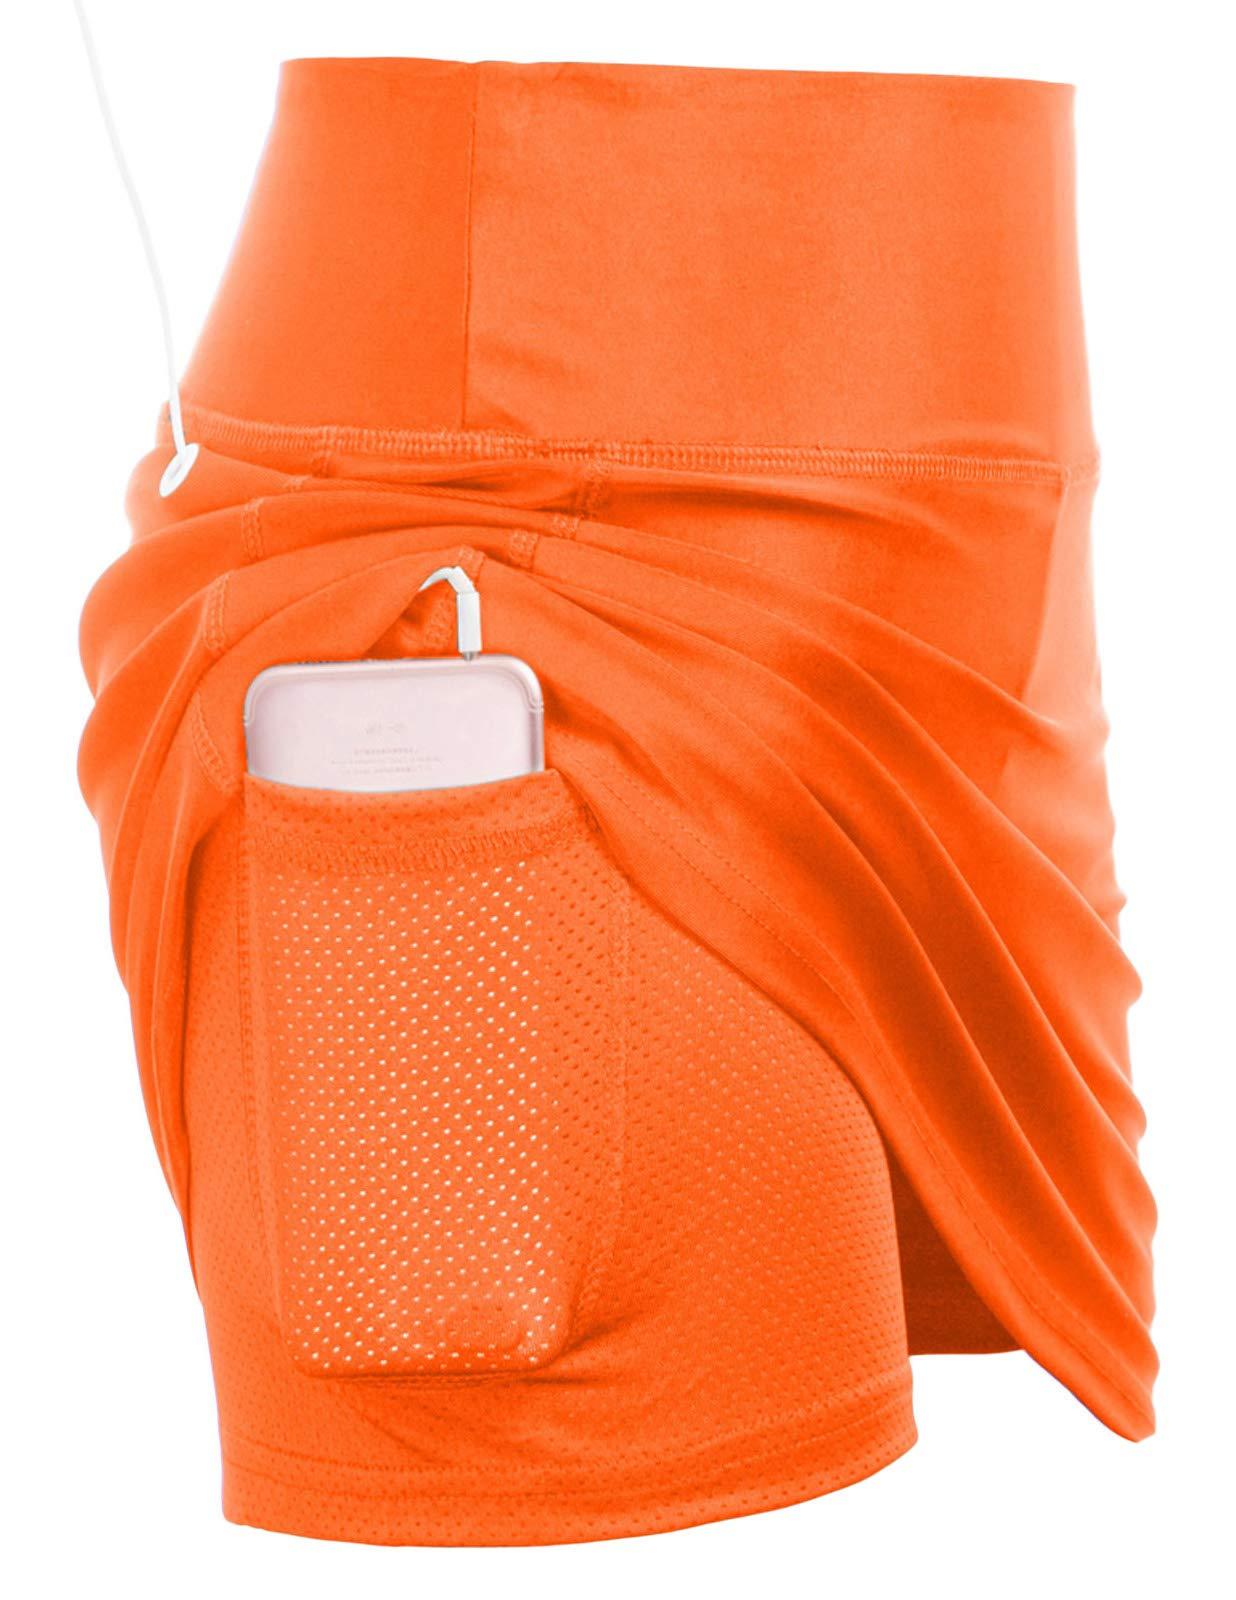 JACK SMITH Women's Athletic Skort Pleated Tennis Golf Skirt with Pockets(L,Orange) by JACK SMITH